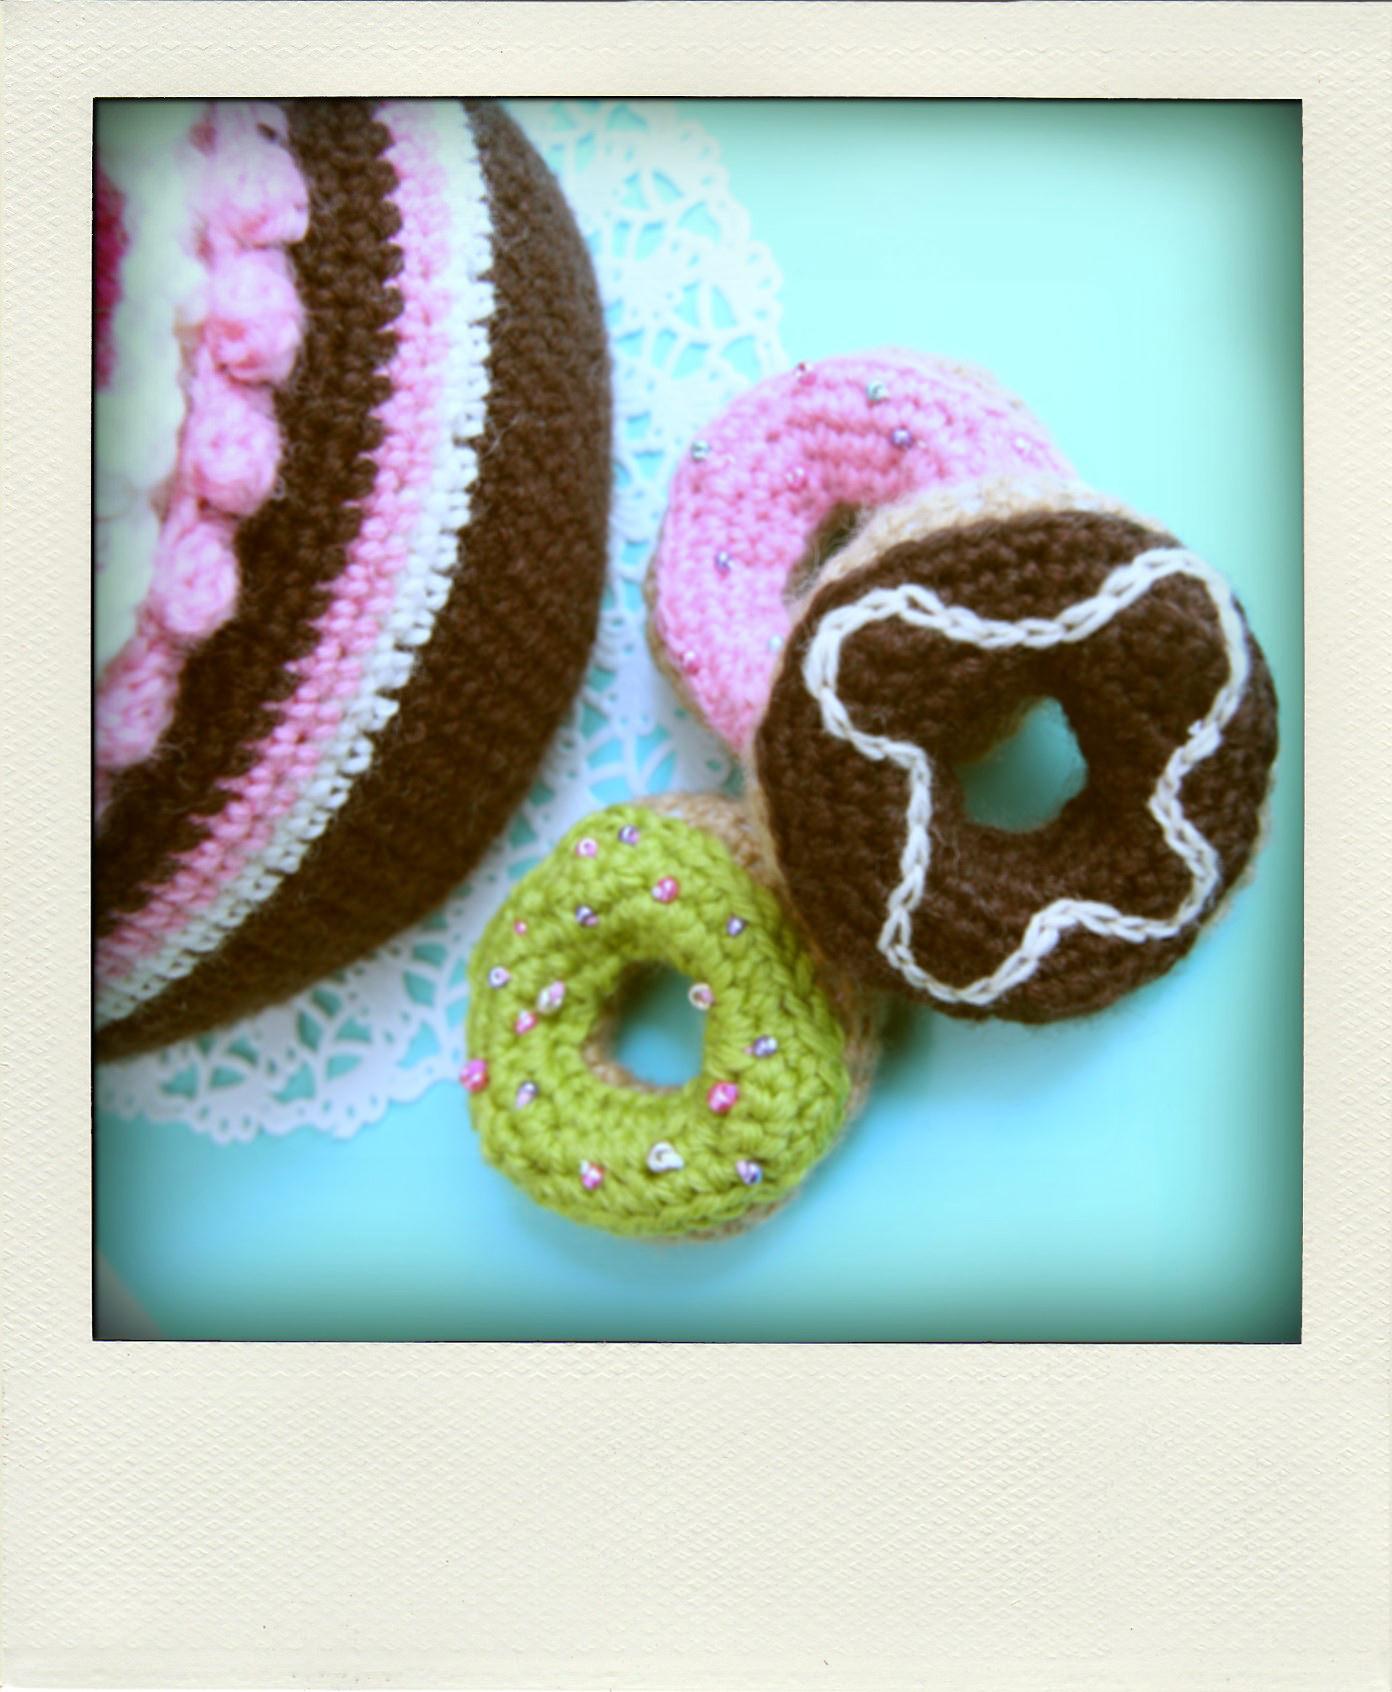 Yes We Knit cafè. Moderni intrecci fra arte e società